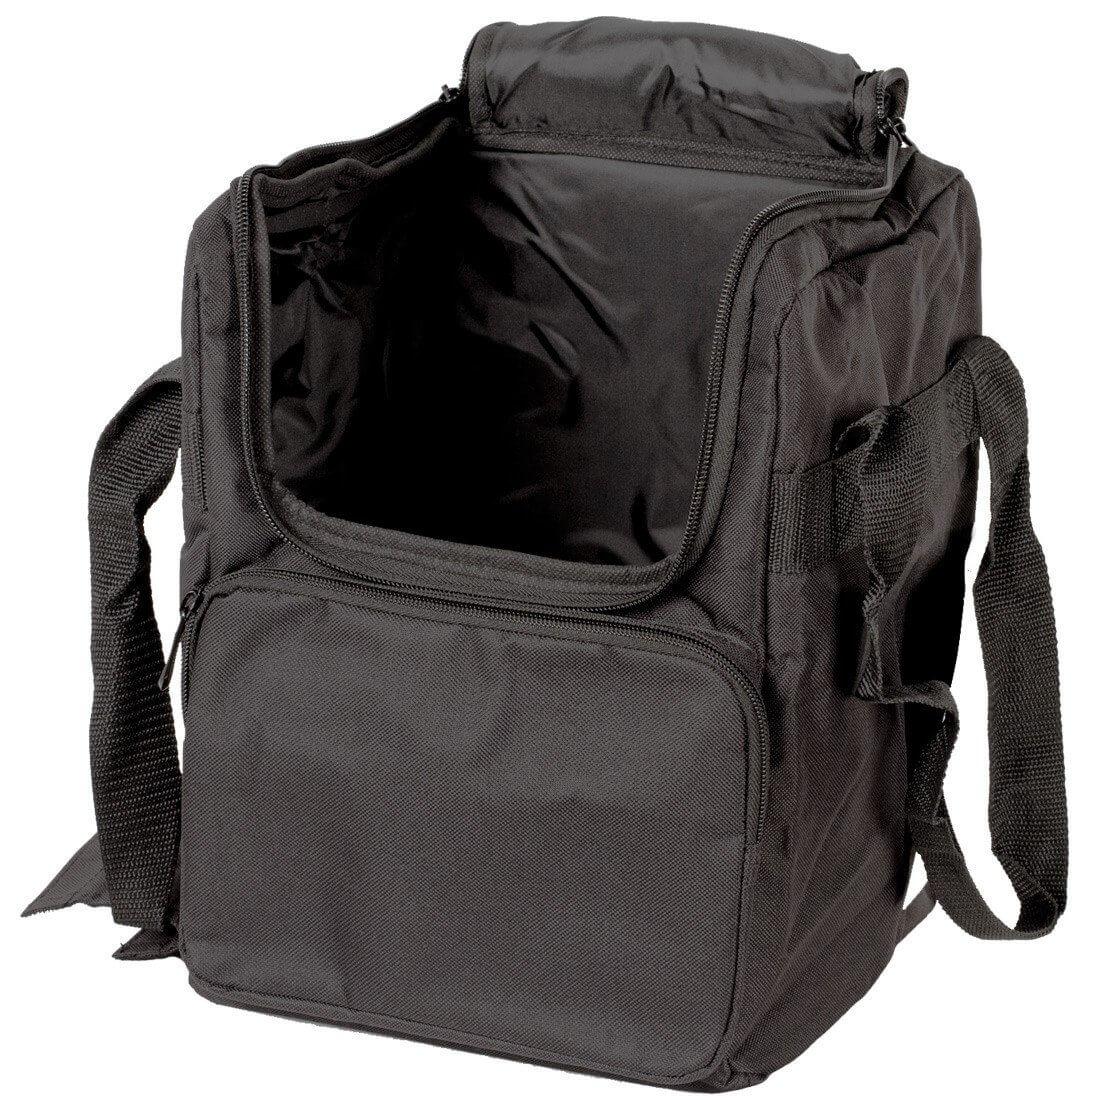 Accu-Case AC-115 Padded Transit Bag Case Flightcase - Fits Stagg Headbanger/ Moving Head